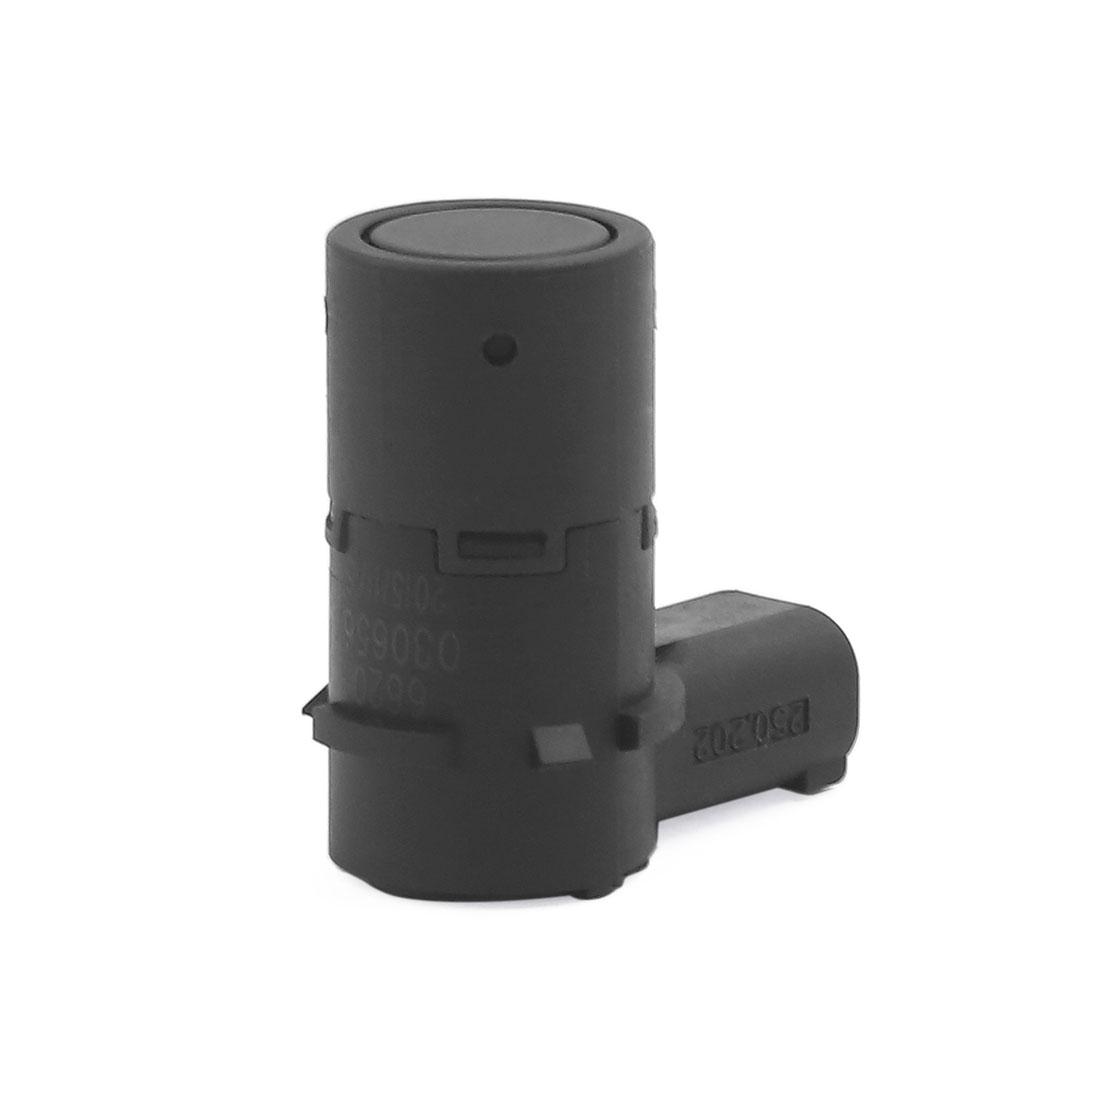 90 Degree Angled PCD Parking Ultrasonic Sensor 66200306567 for BWM 535i 650i 550i Z4